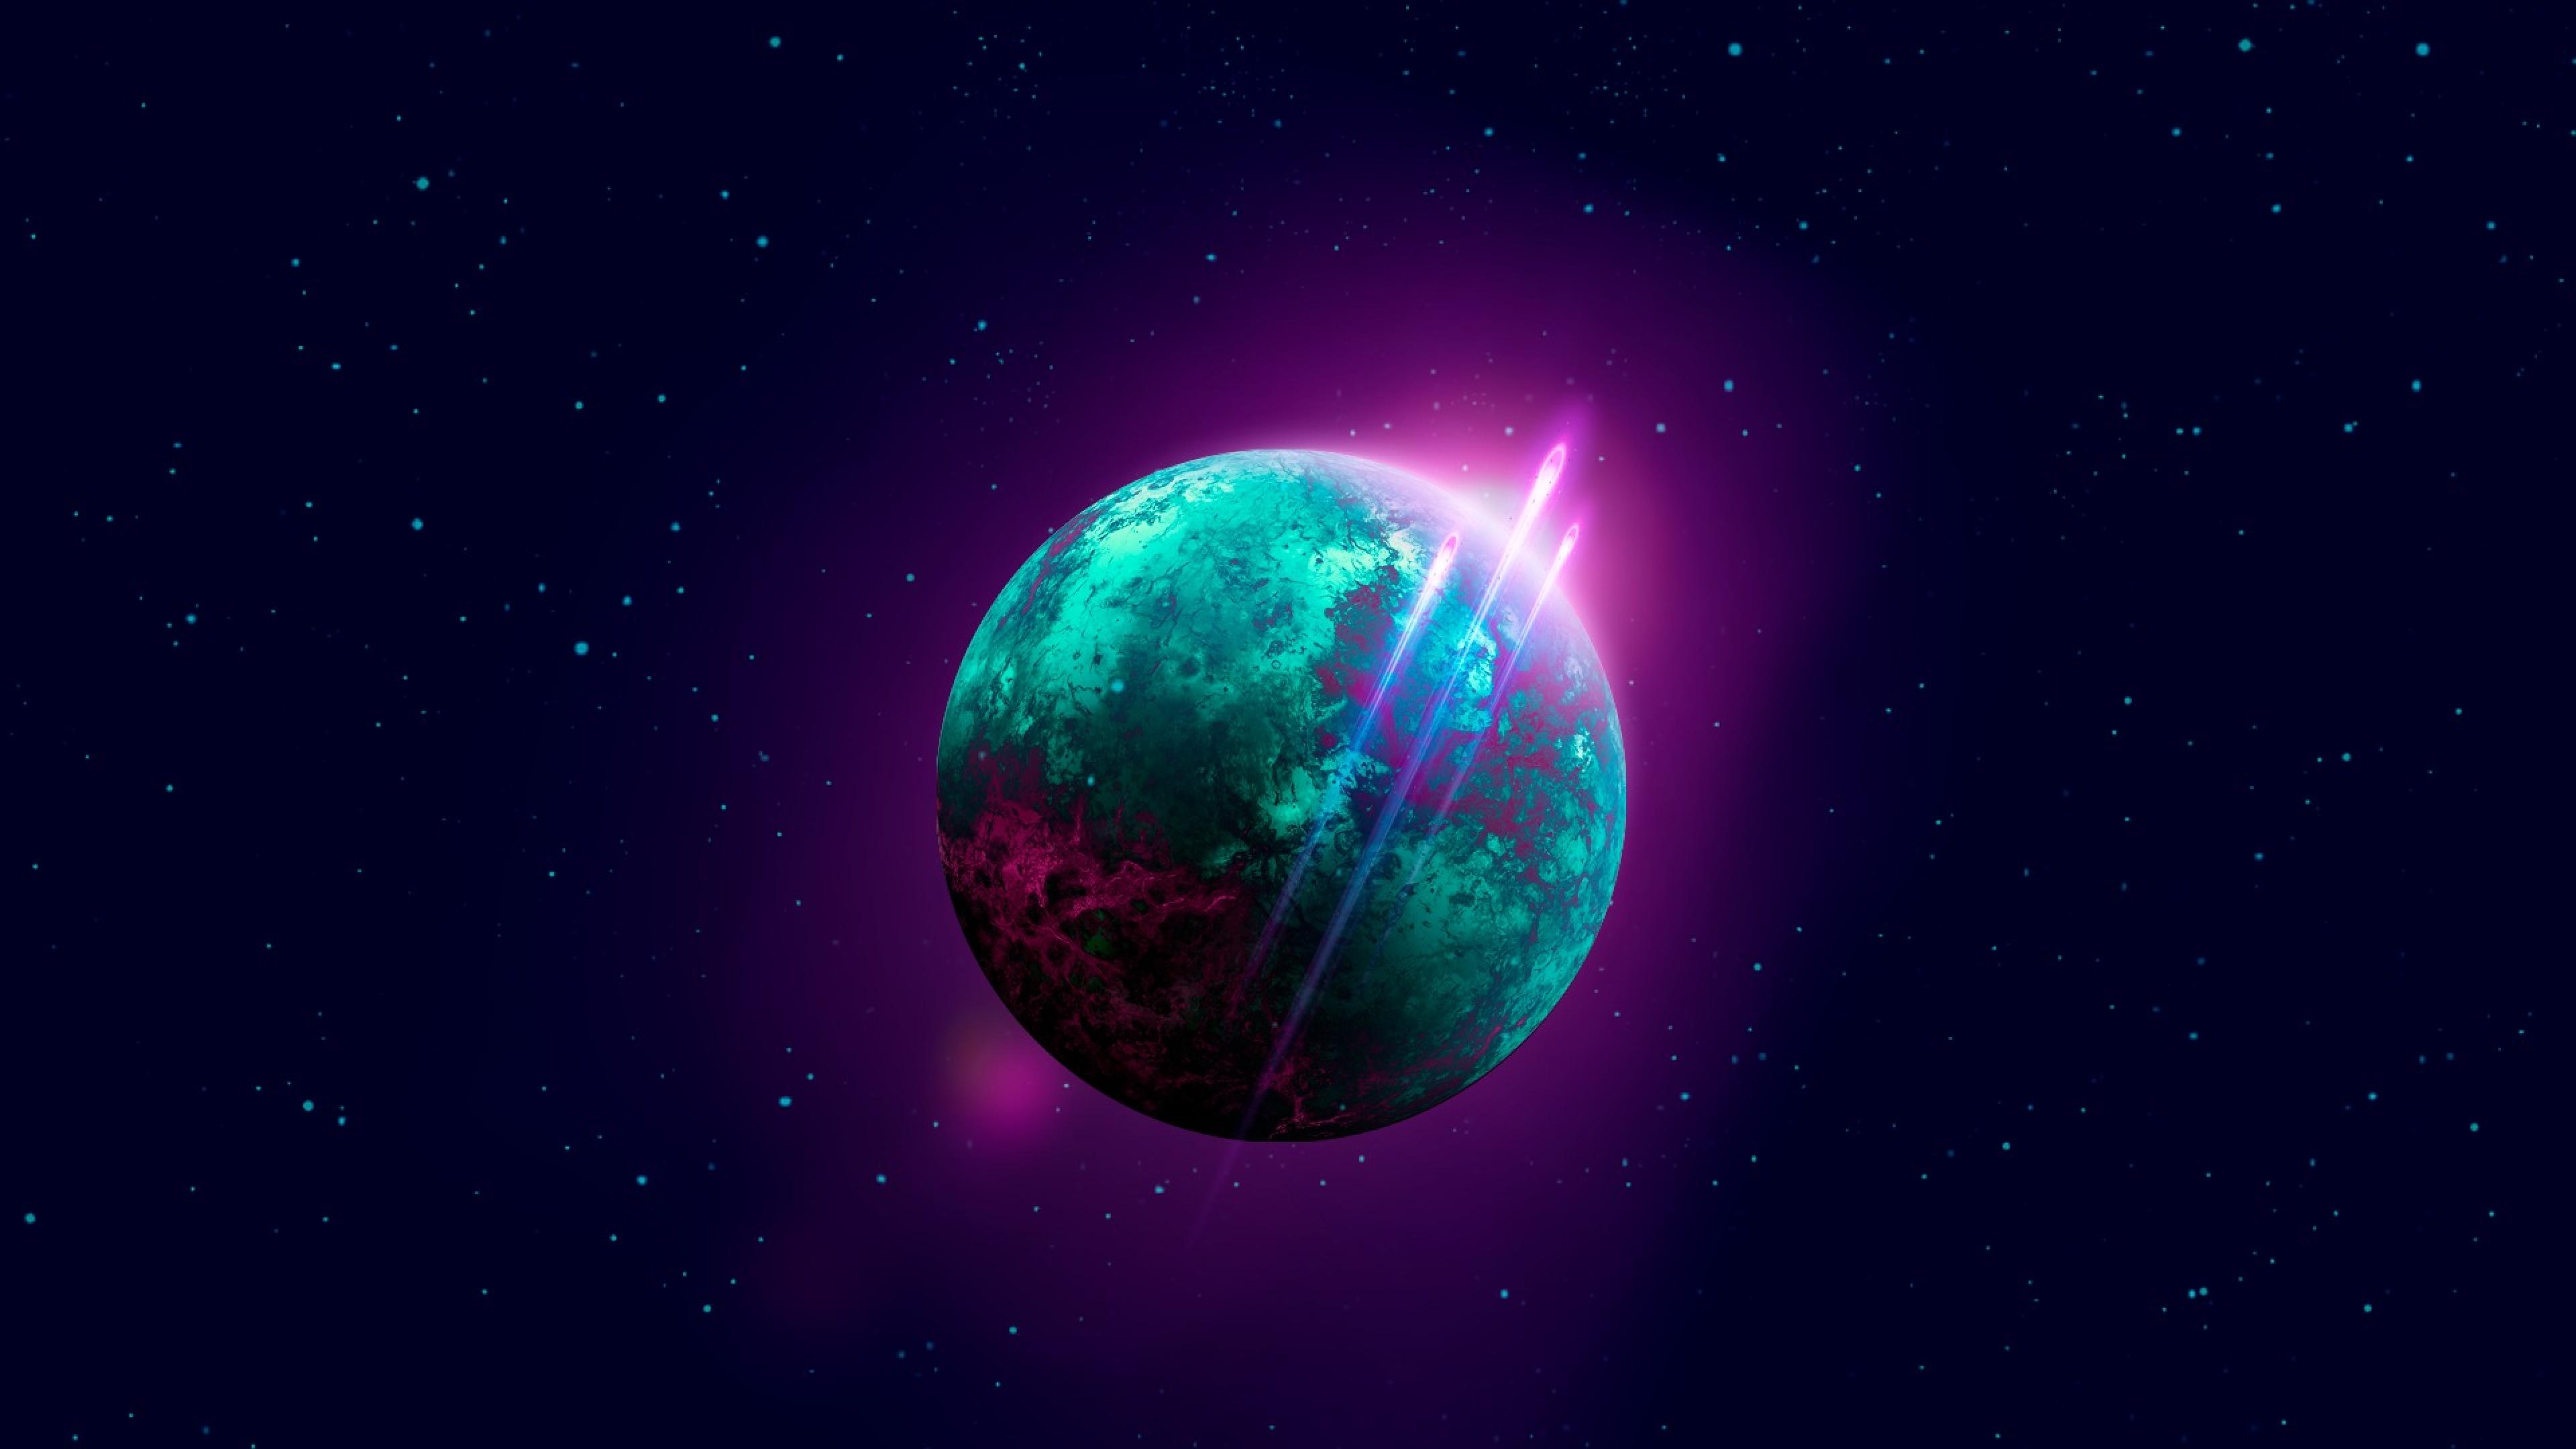 3840x2160 Space Retro-wave Planet 4K Wallpaper, HD Space ...